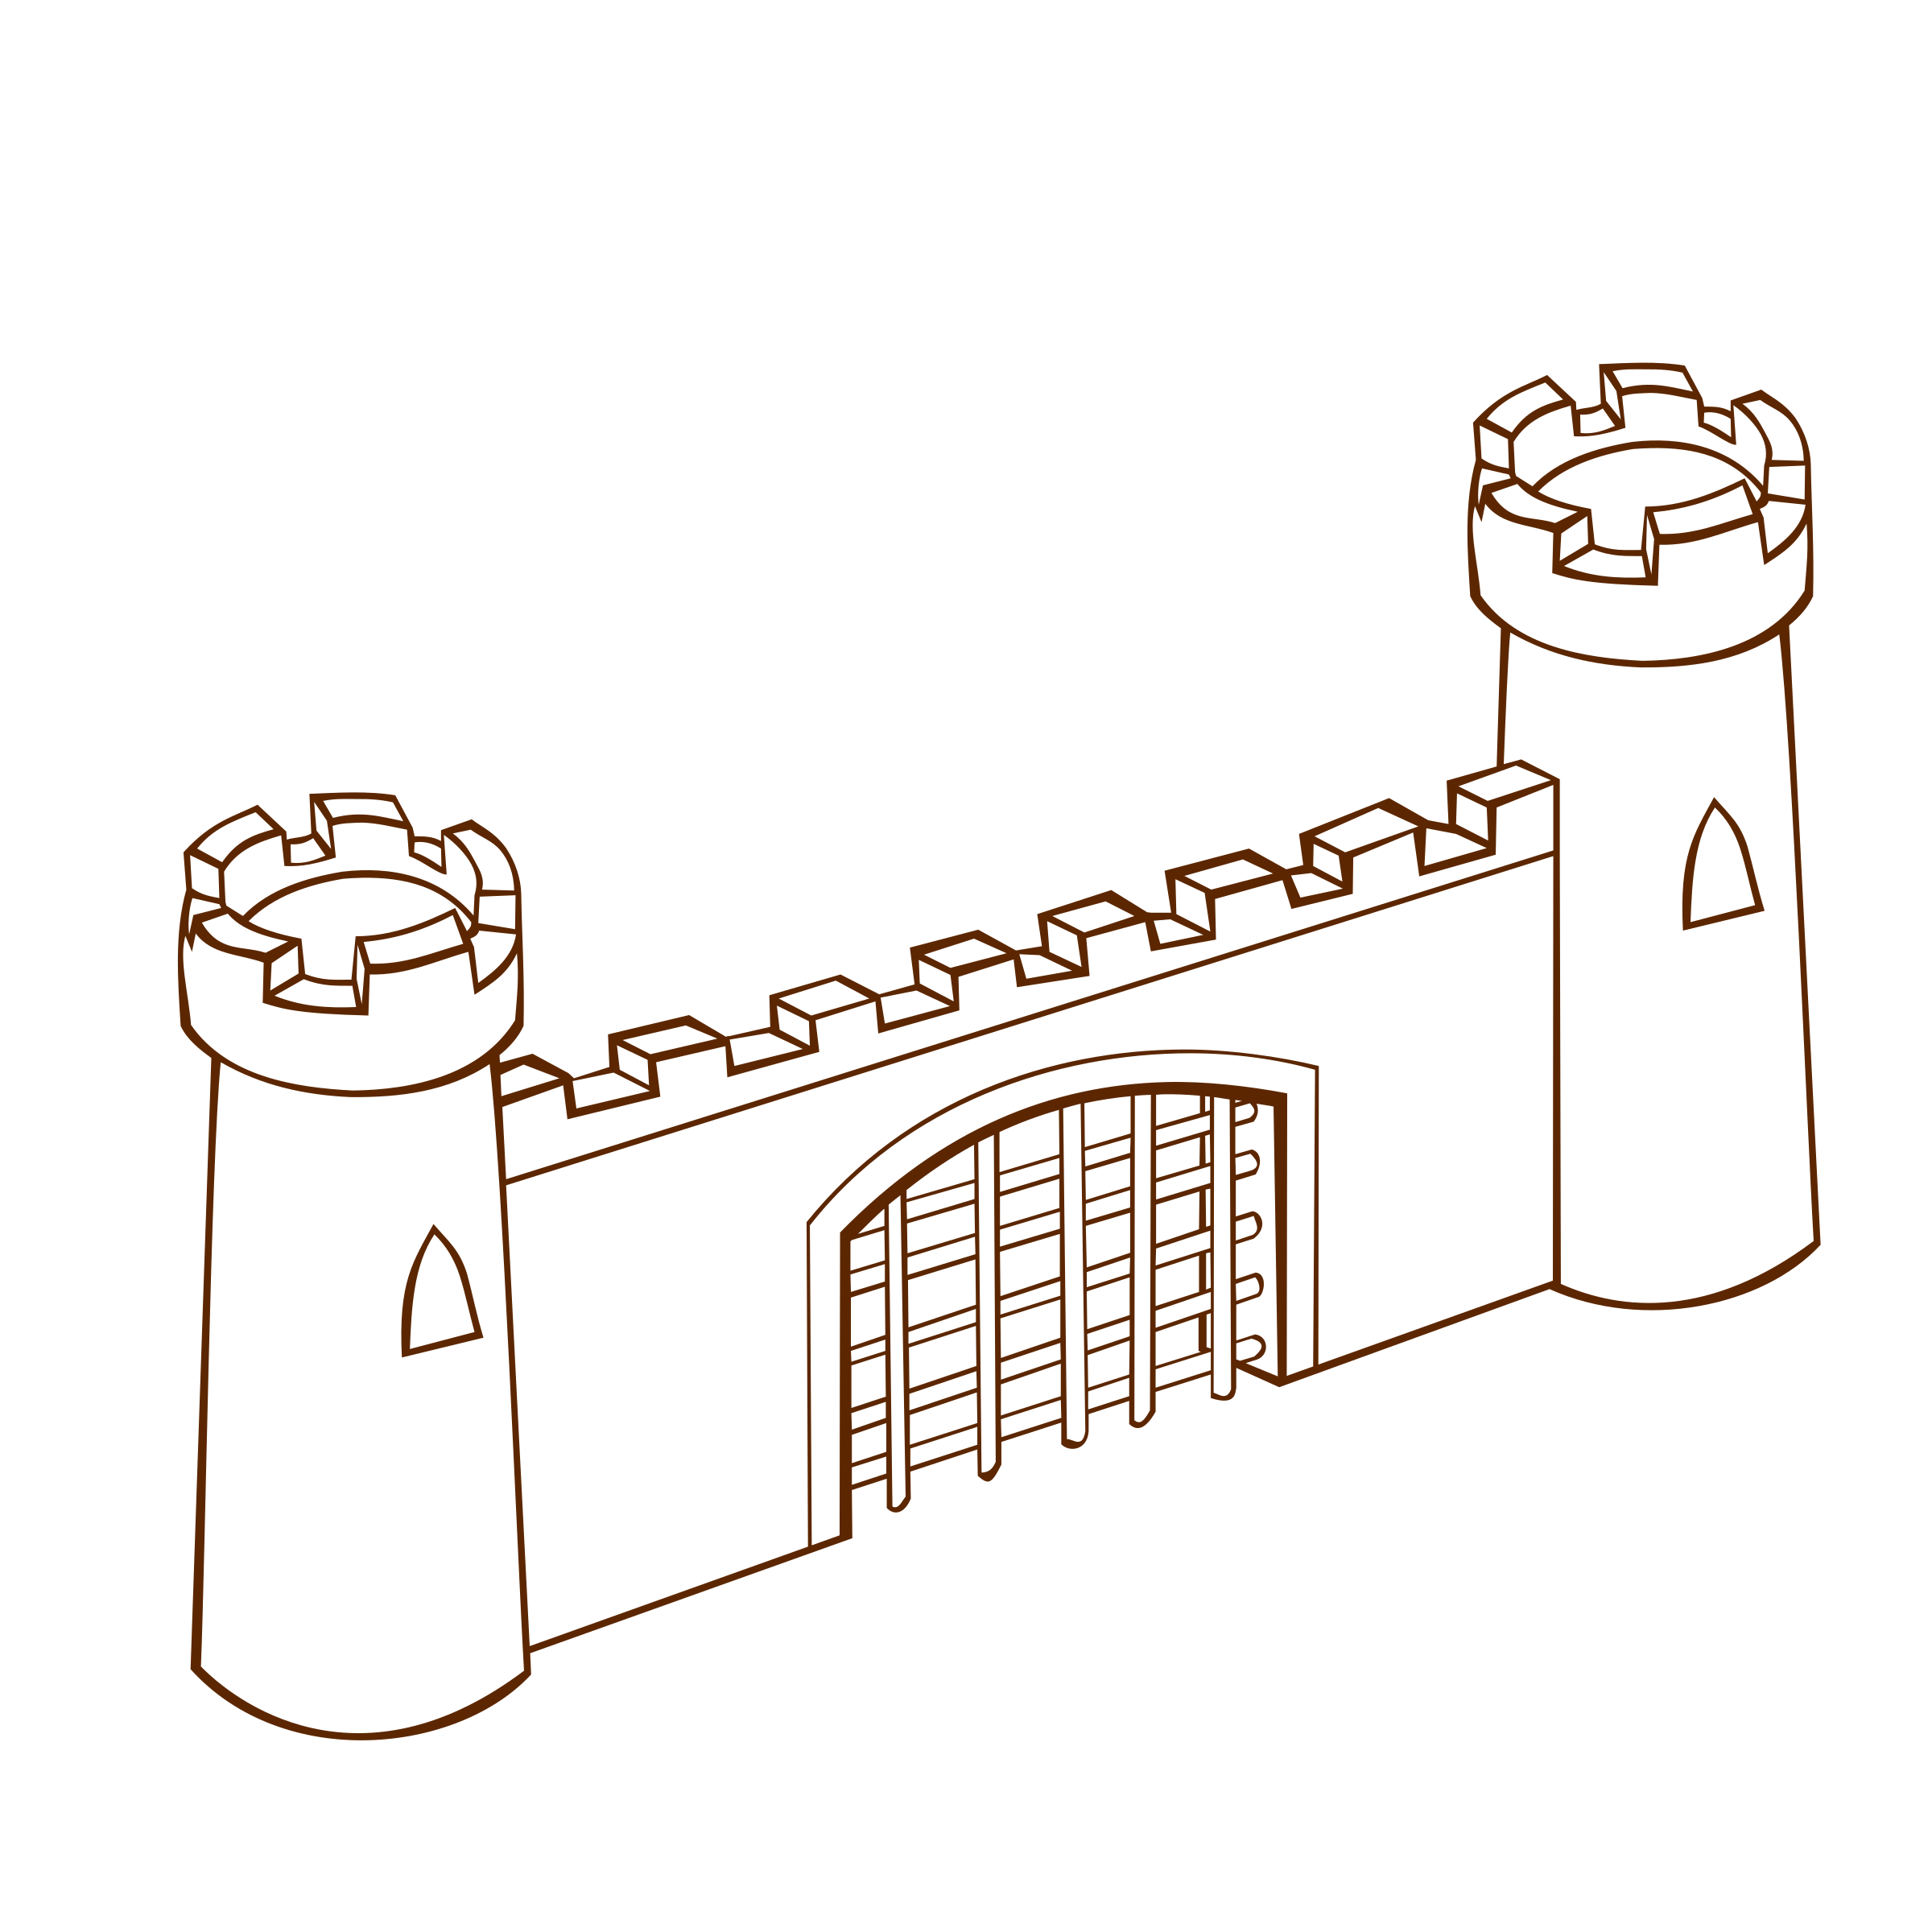 Clipart castle symbol. Rpg map symbols gate